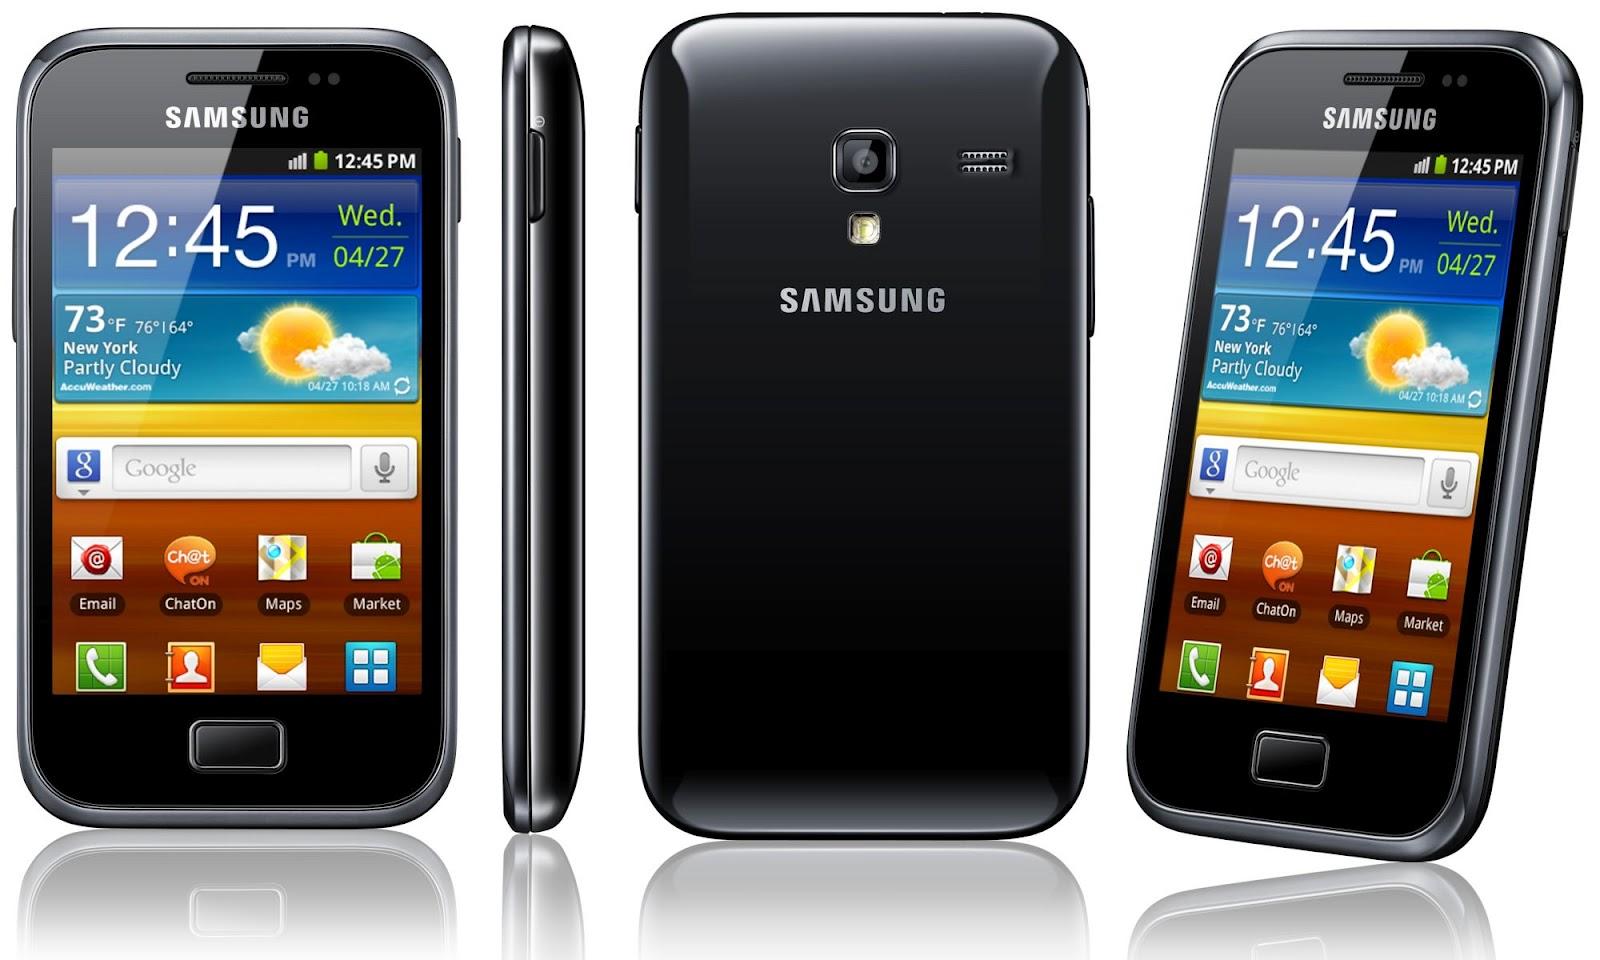 Samsung Galaxy Ace Plus S7500 ကို CWM သြင္း၊ Root ၿပီး Android 4.2.2 Jellybean Custom ROM တင္ရေအာင္